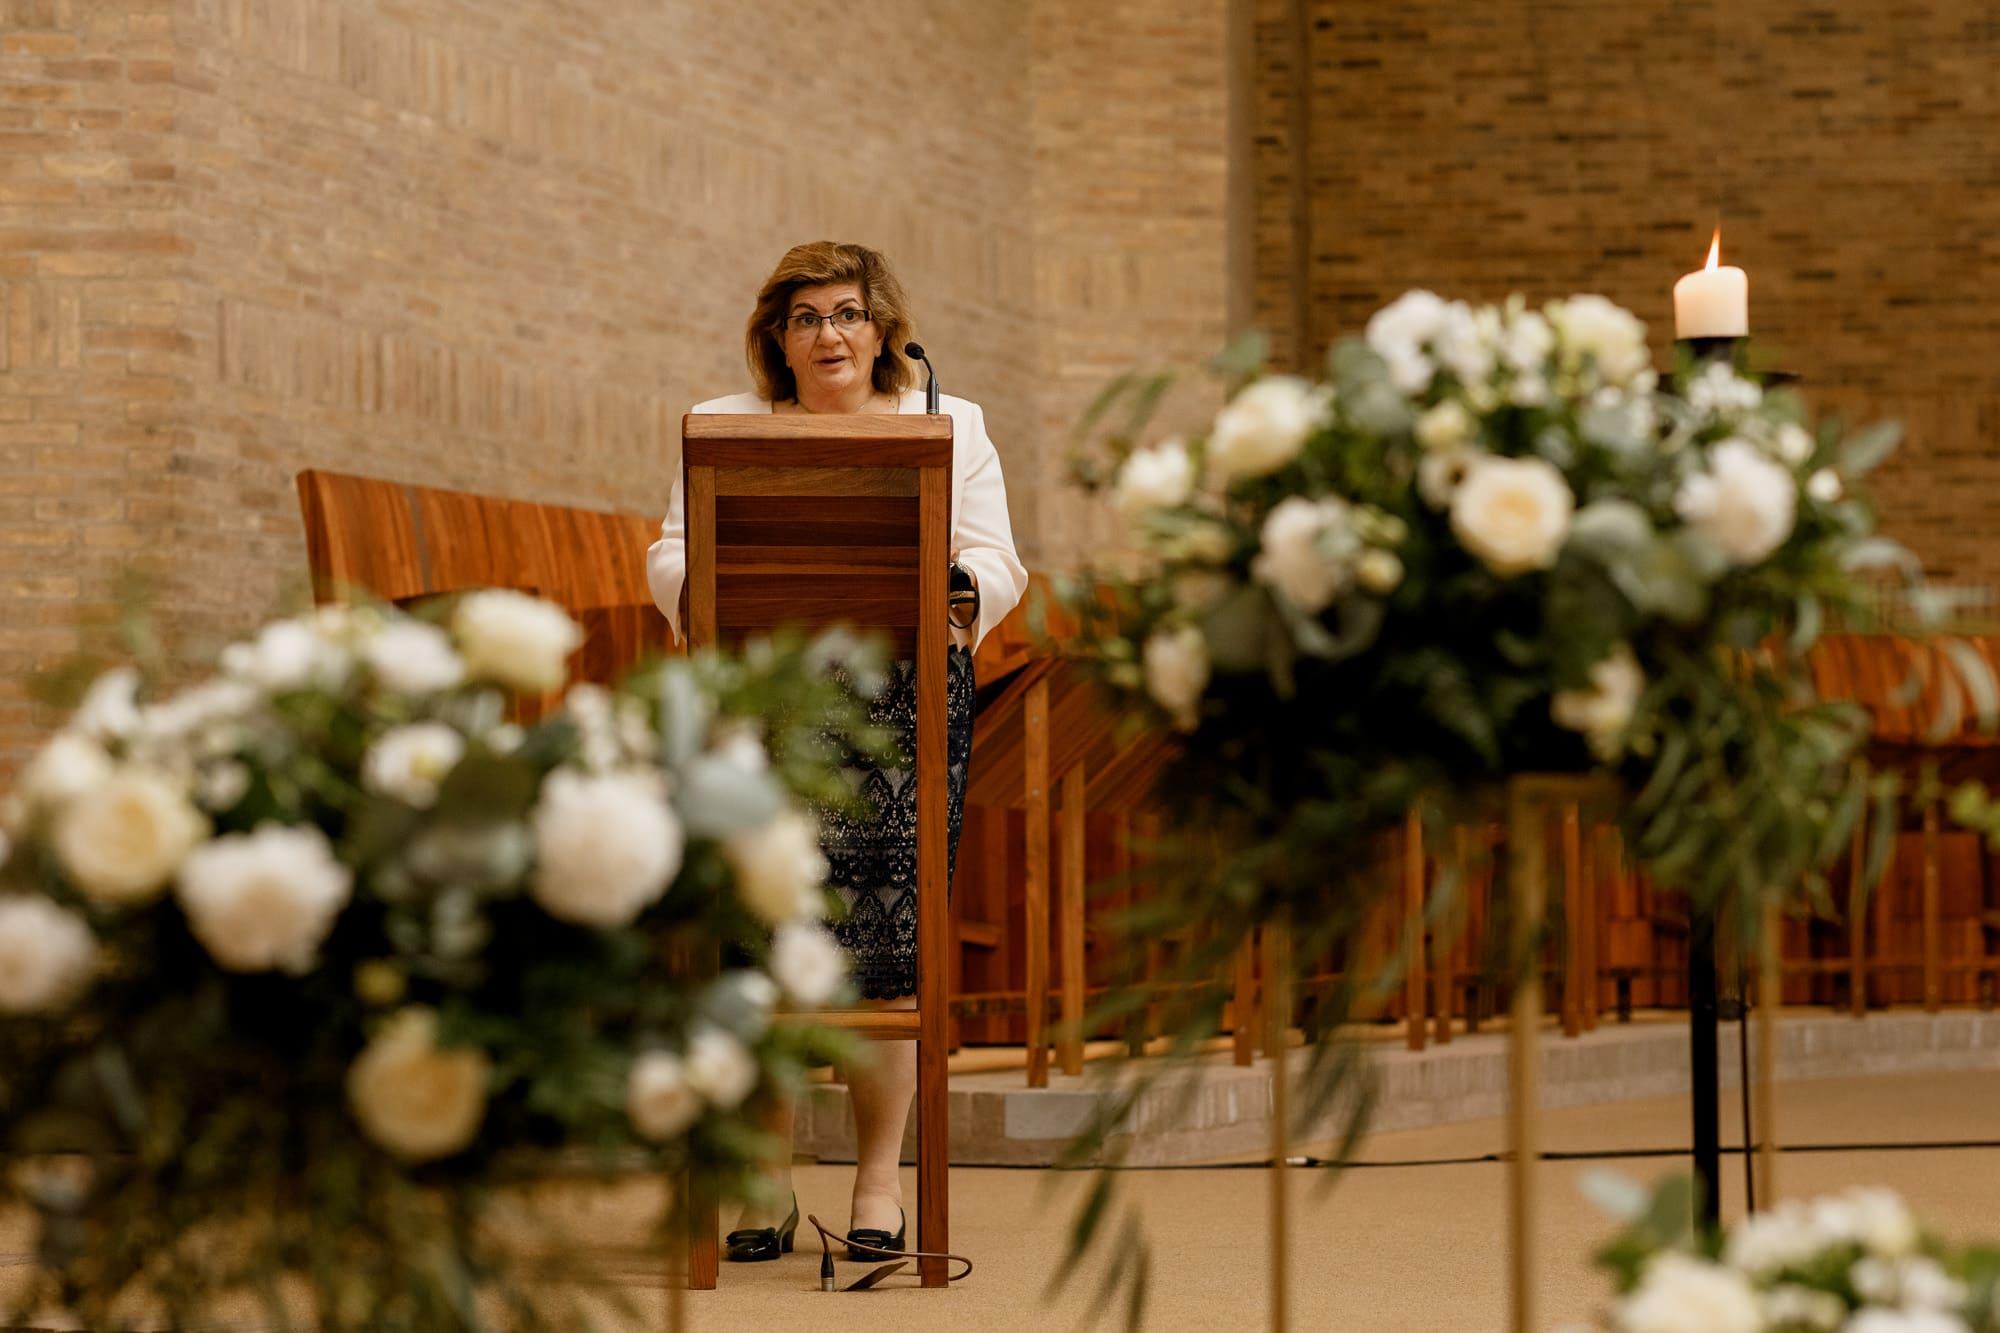 wedding speech behind flowers